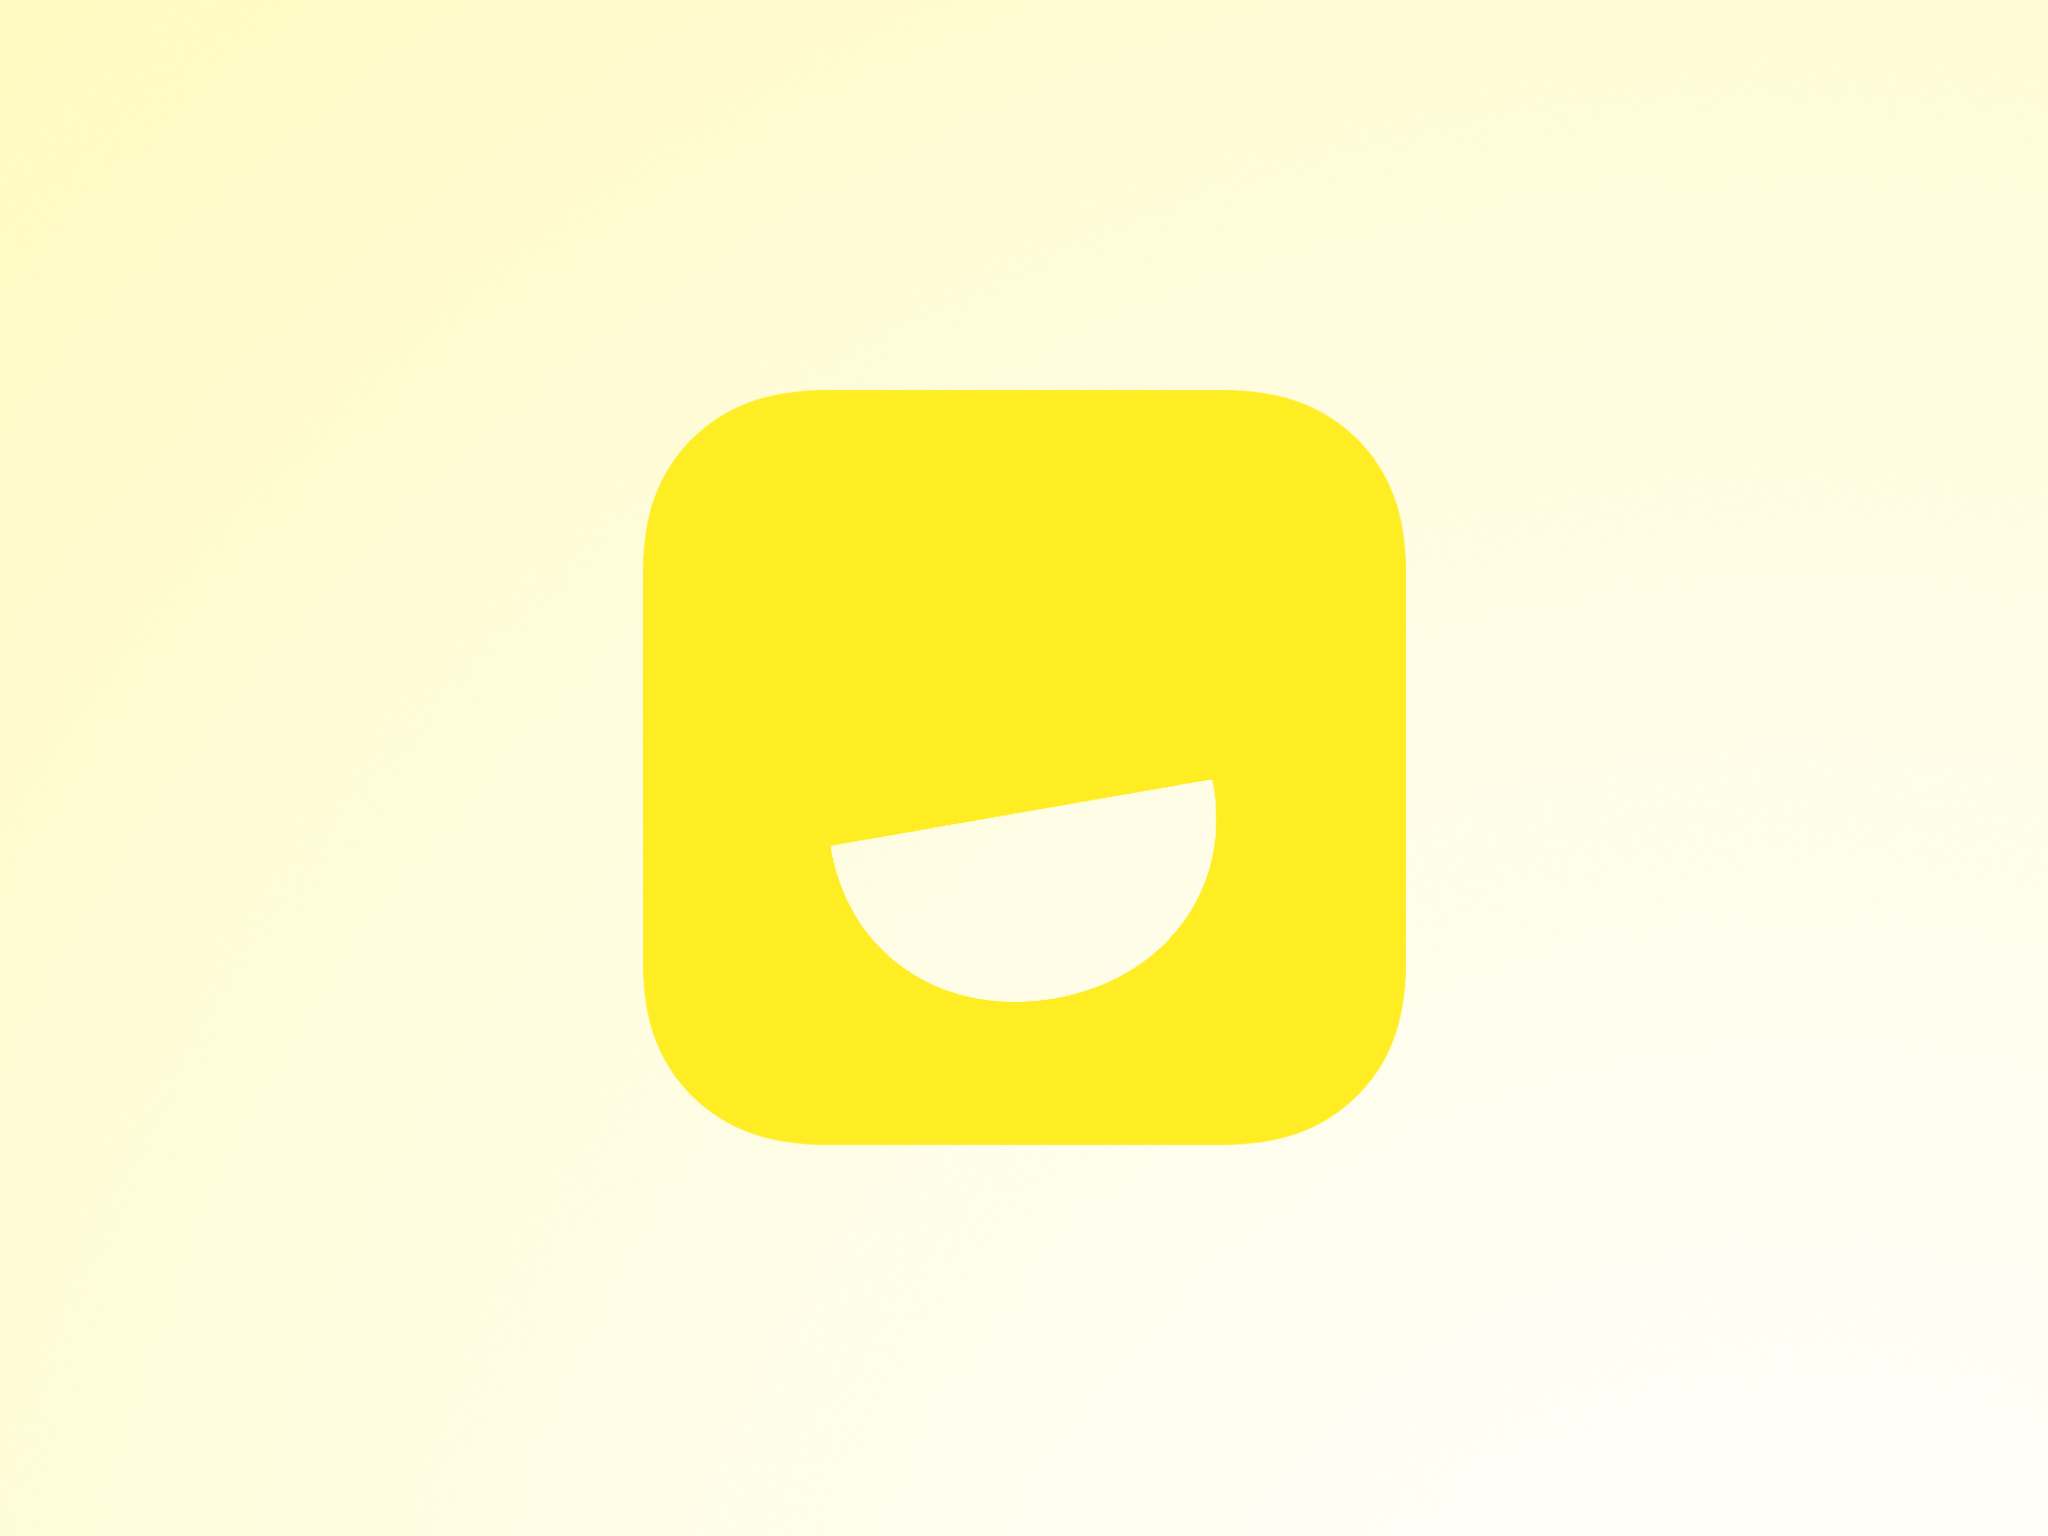 Yubo video chat app logo